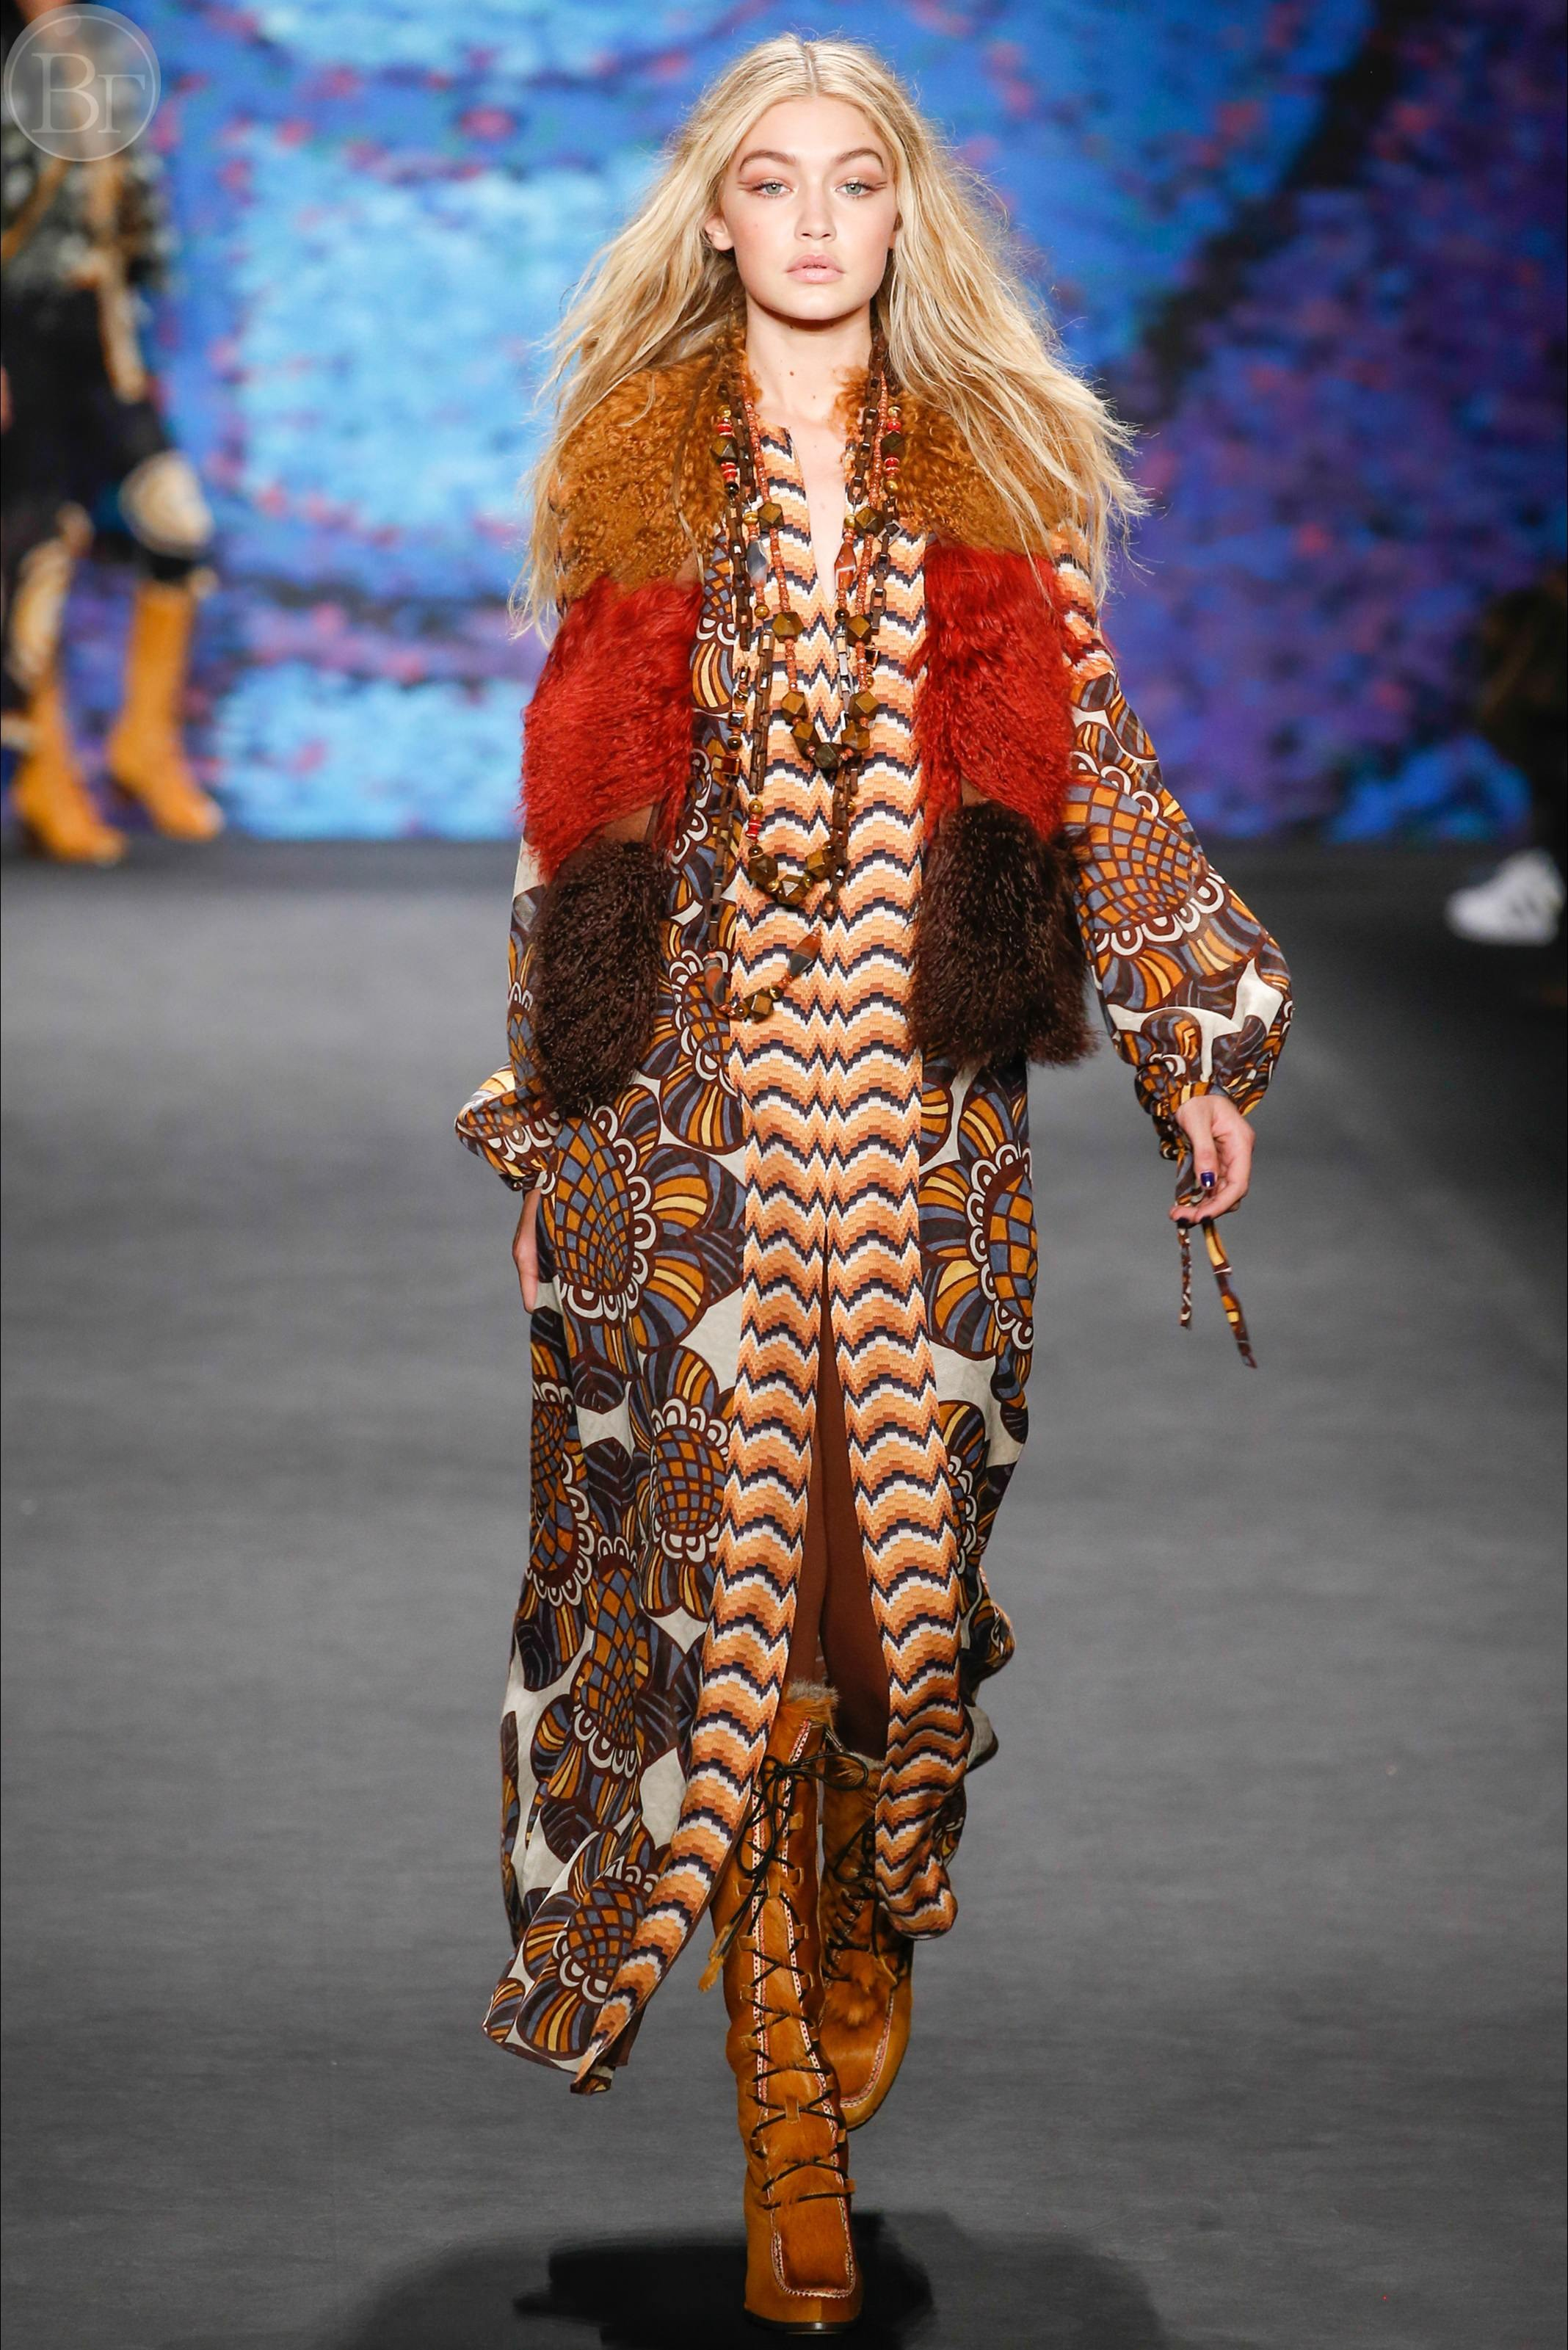 Бохо стиль, совмещенный со стилем хиппи – коллекция Anna Sui